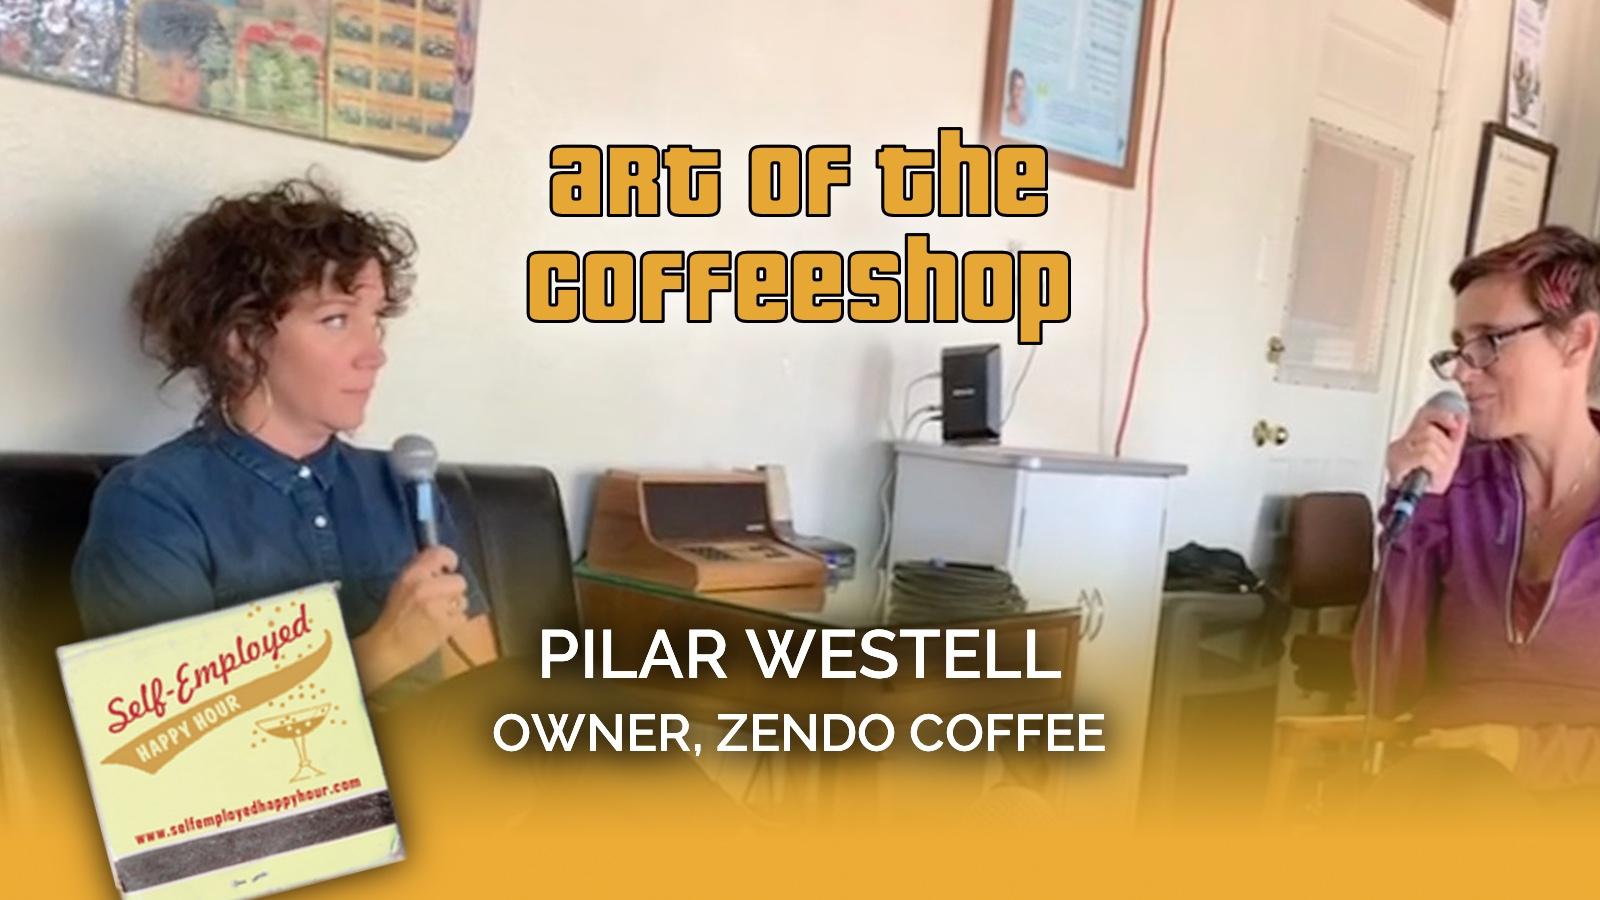 Art of the Coffeeshop: Pilar Westell, Owner of Zendo Coffee